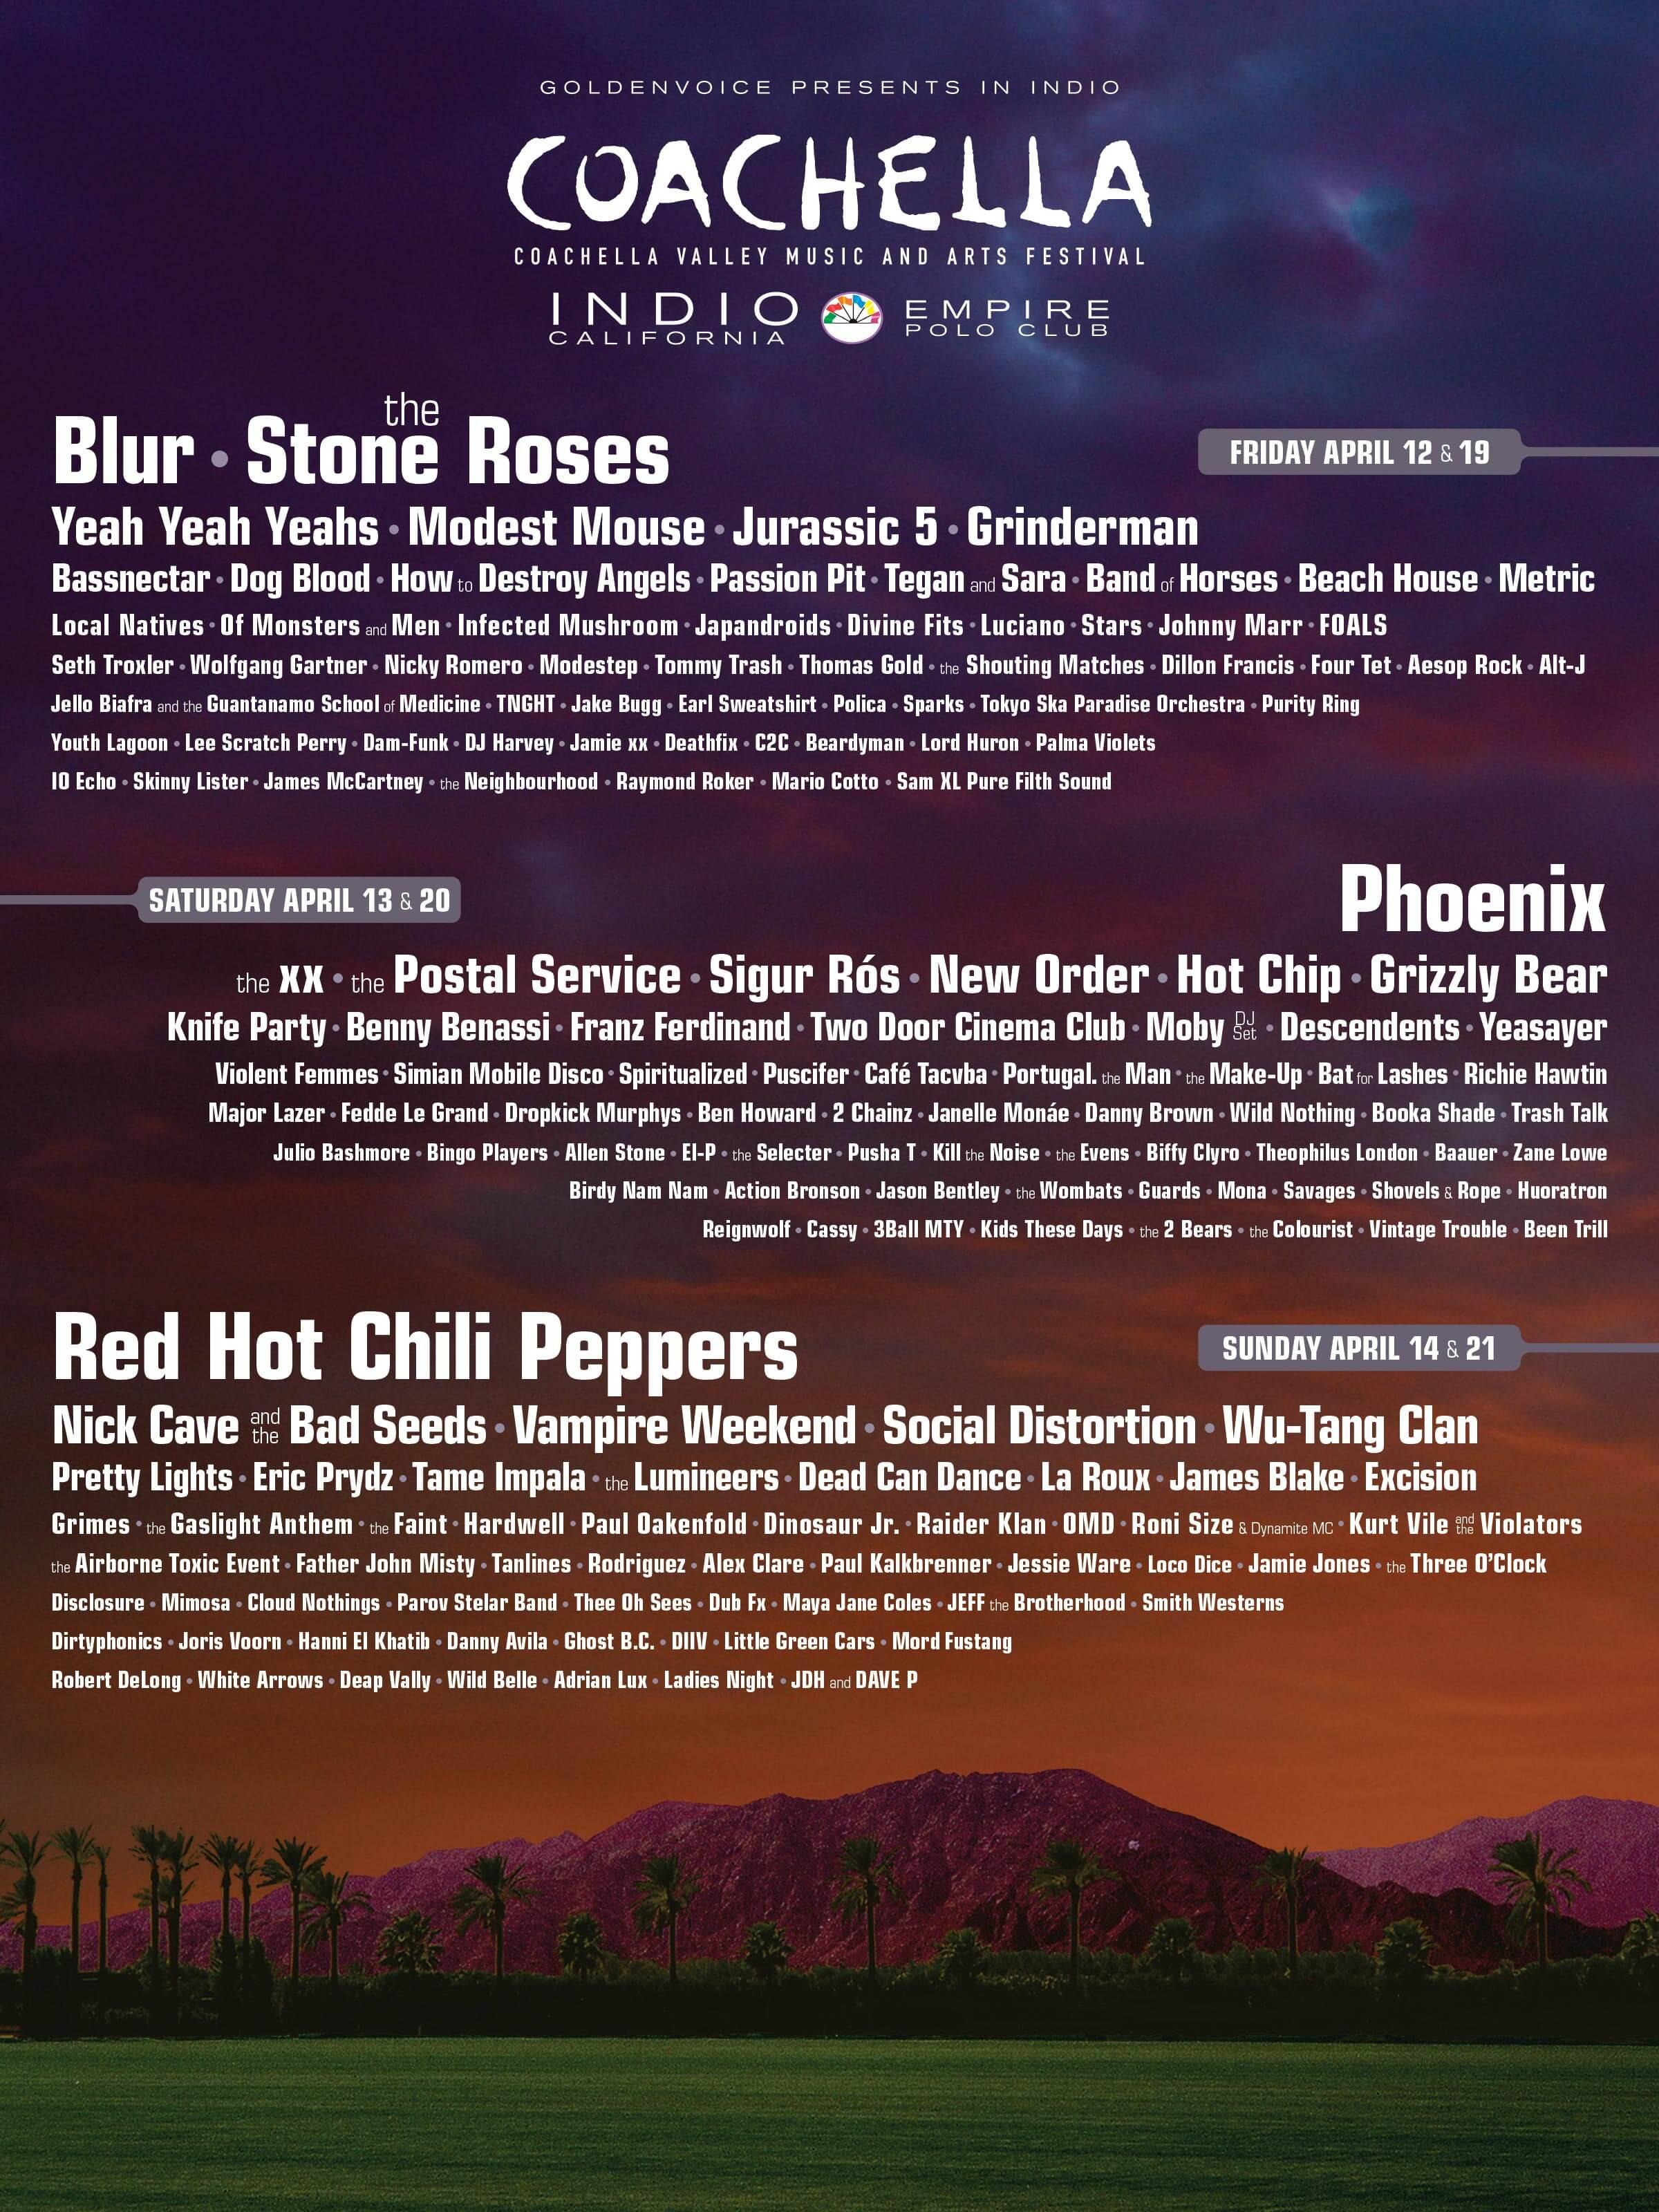 Coachella 2013 Lineup Poster